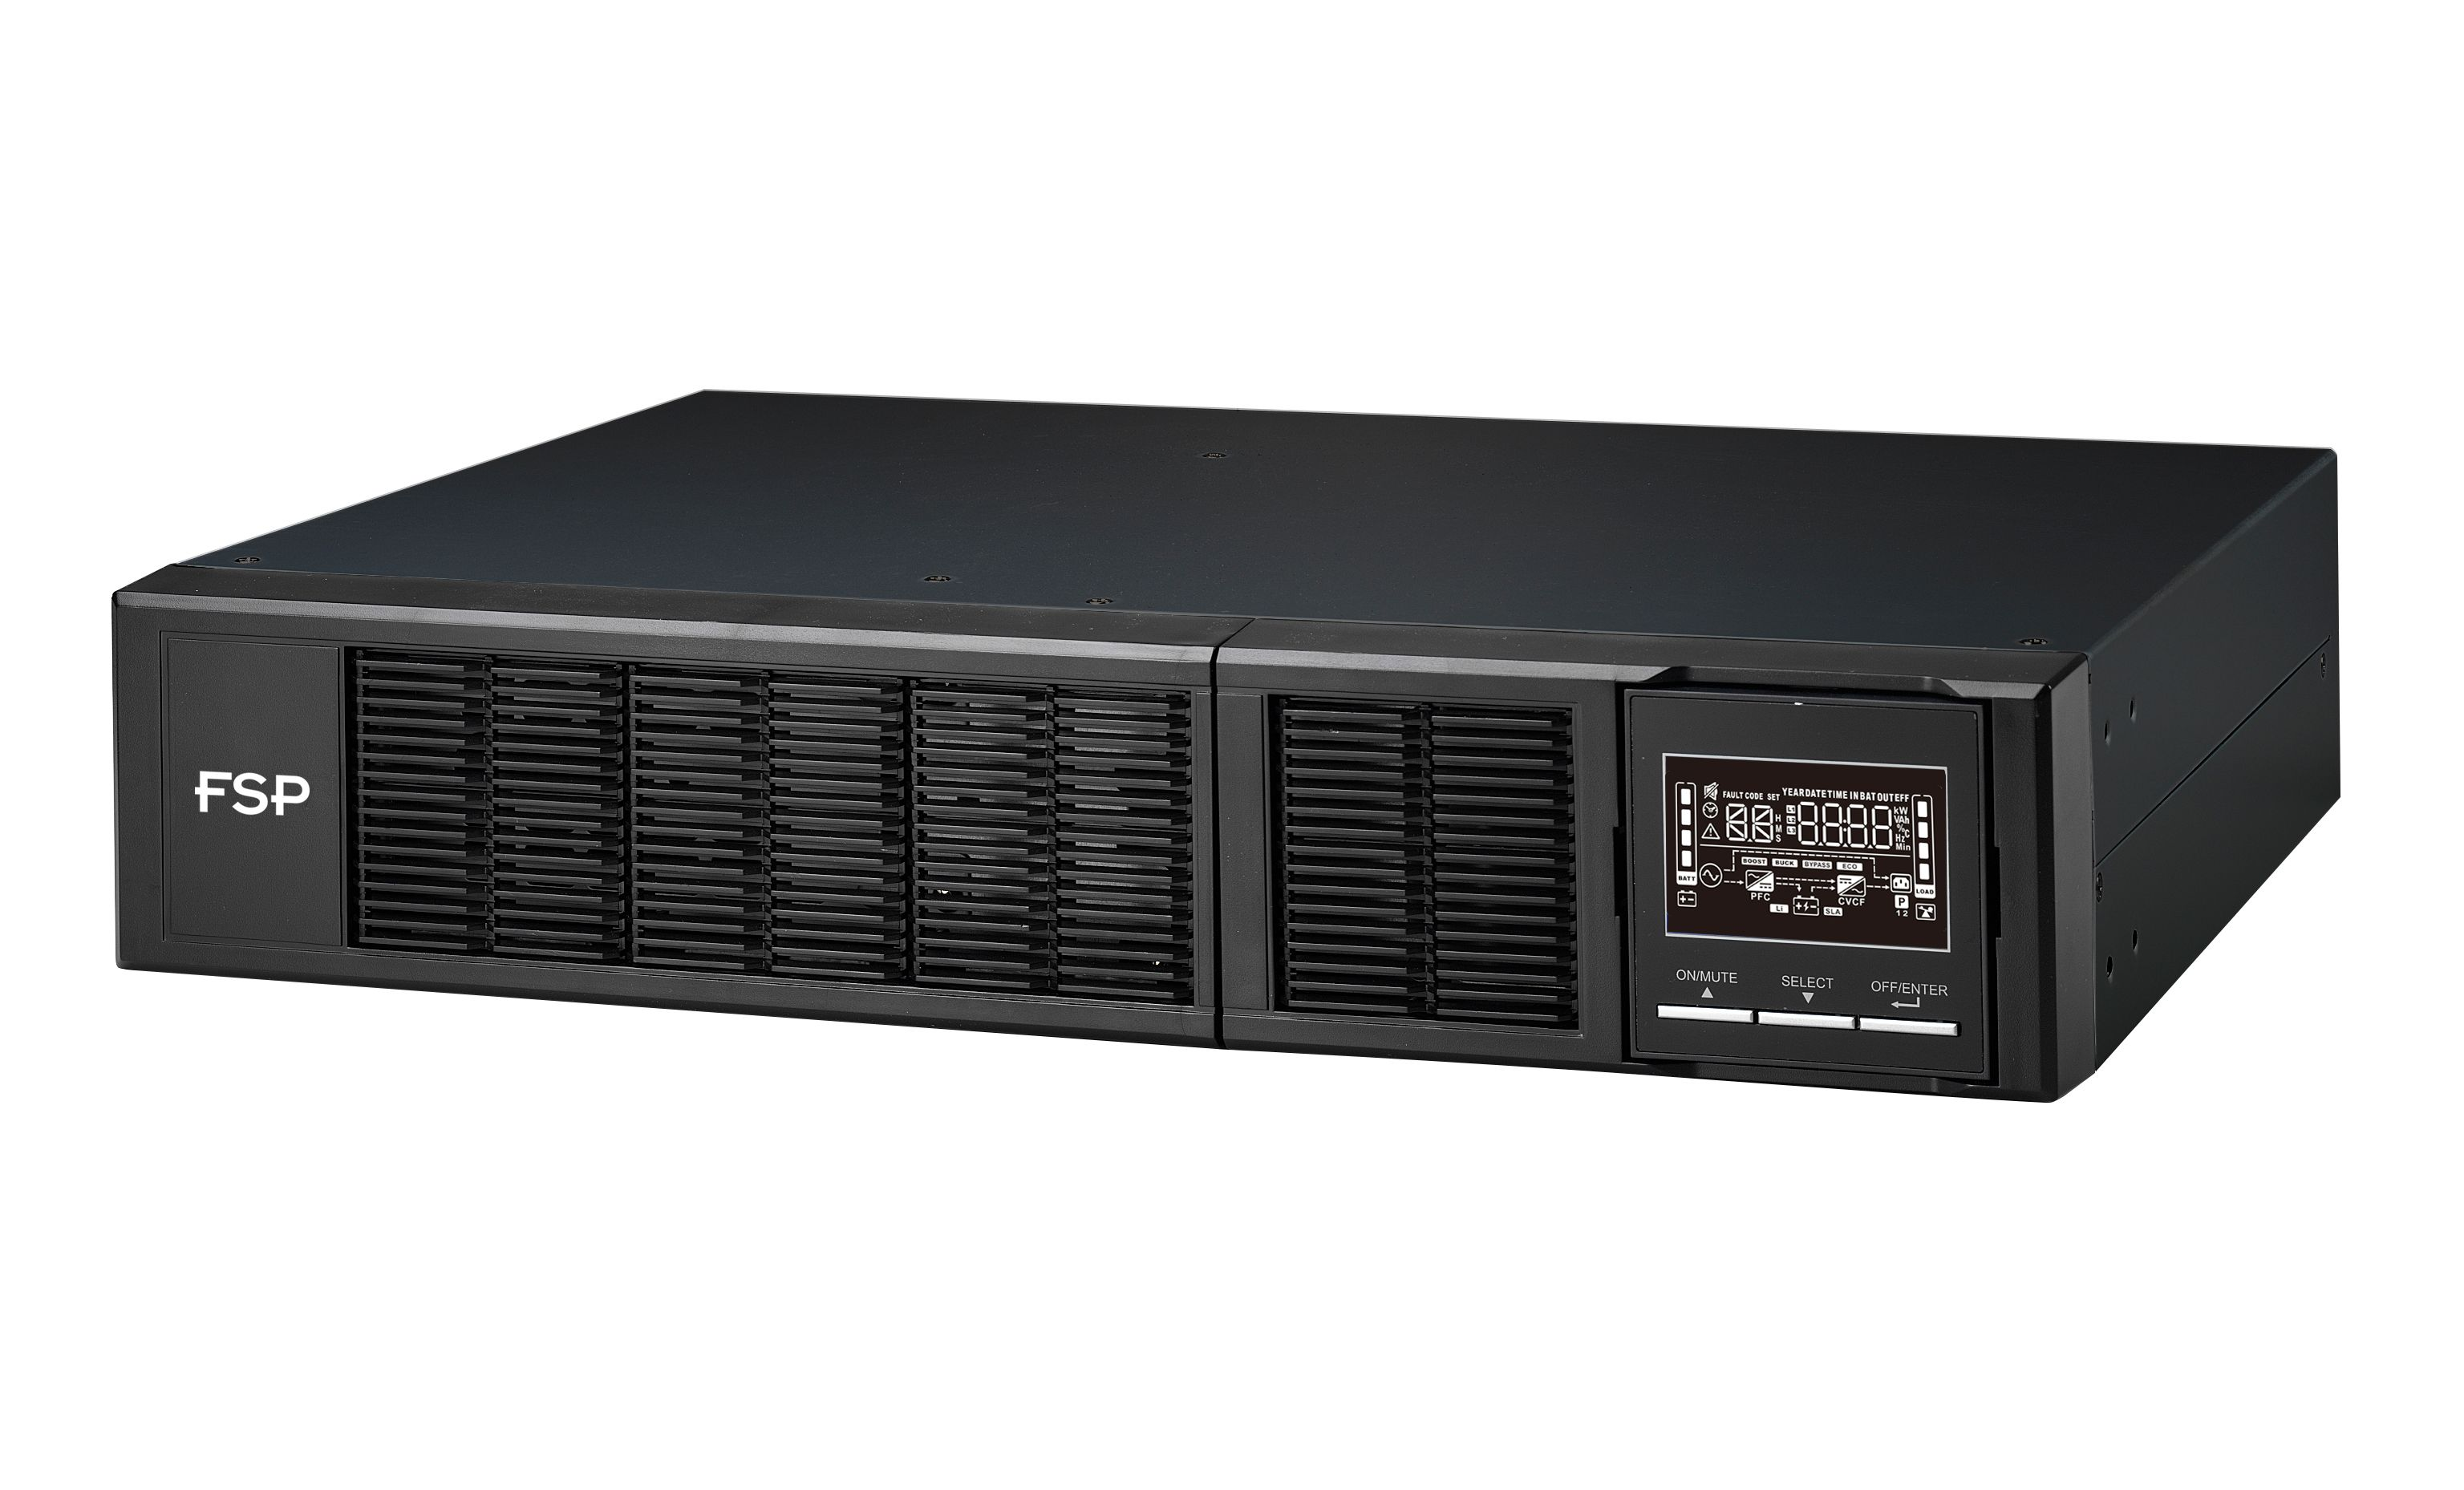 FSP/Fortron UPS Clippers RT 2K 2U, 2000 VA/2000 W, online